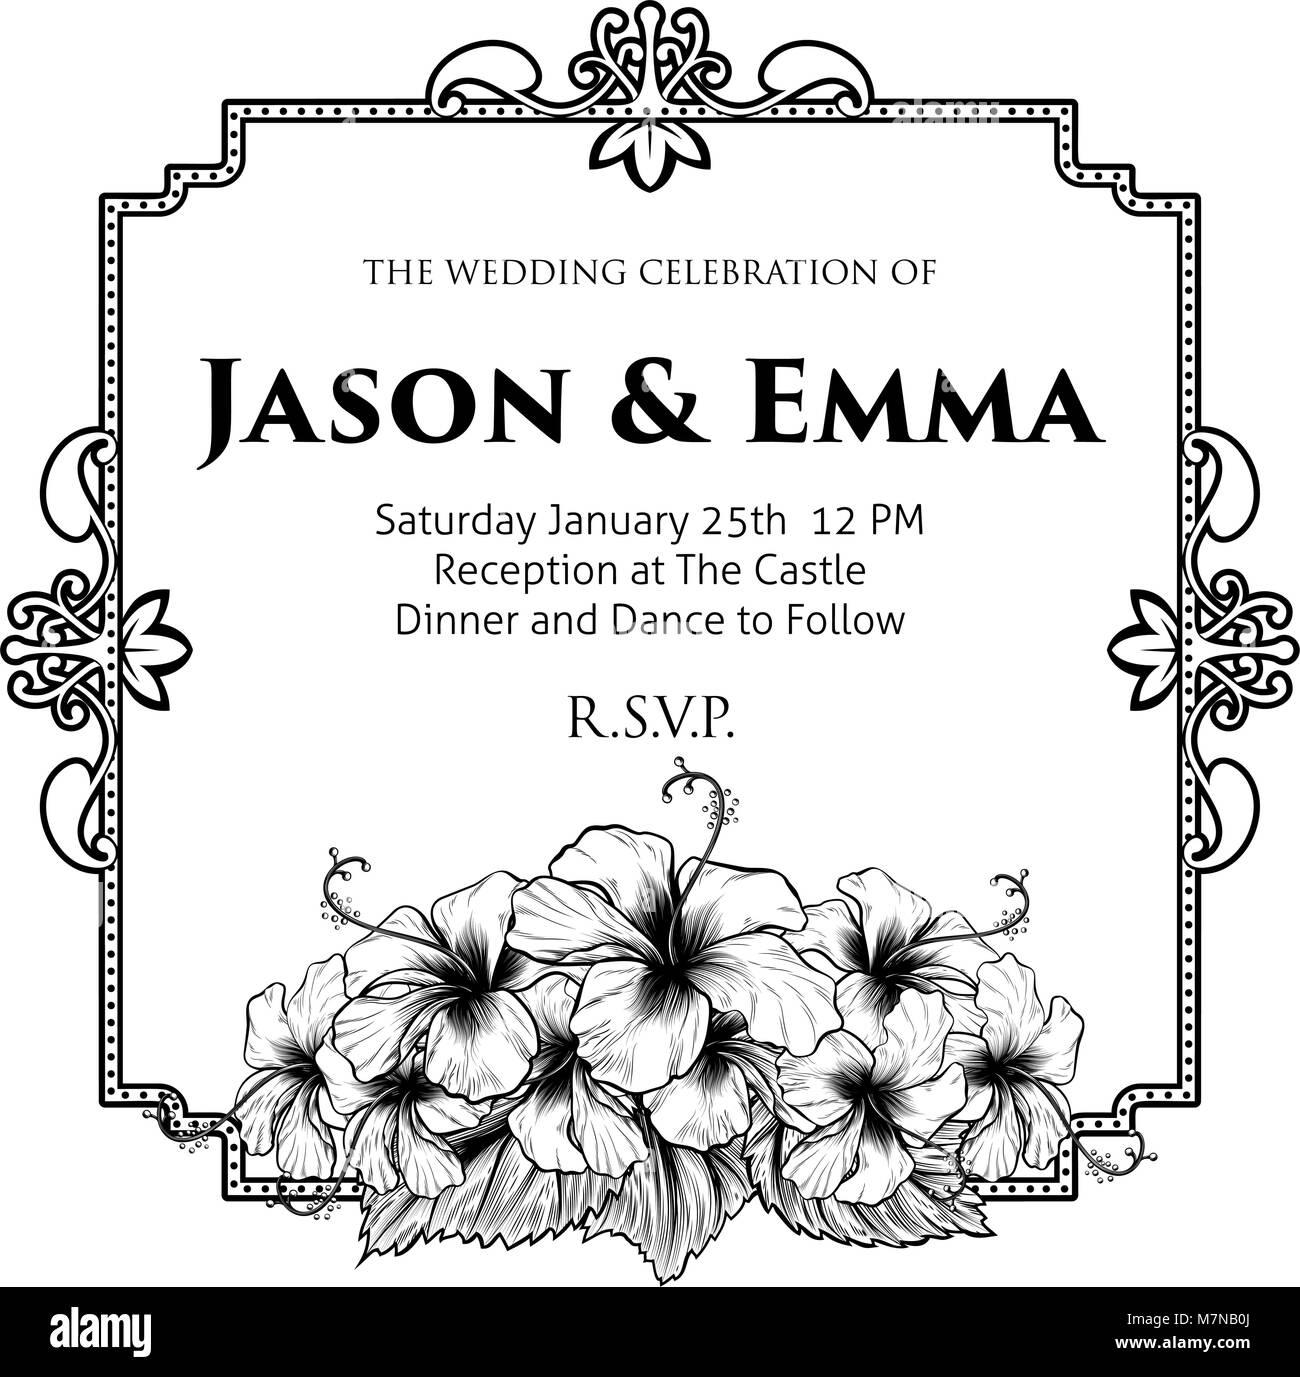 Hibiscus flowers wedding invitation template stock vector art hibiscus flowers wedding invitation template izmirmasajfo